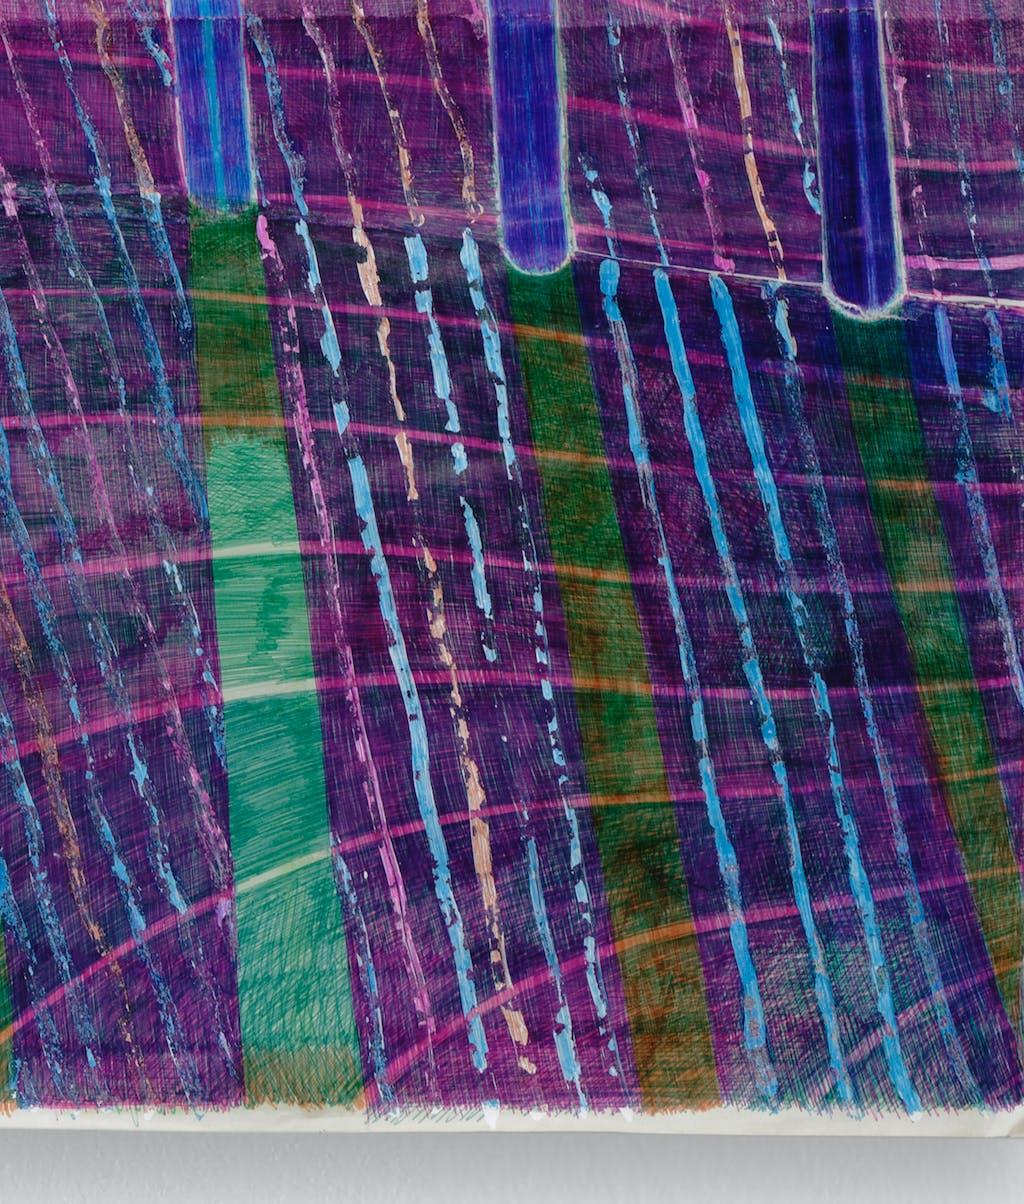 Anne Bourse *Stupid sun who can't stop moving (love is a jail)*, 2020 Felt pen, typex and ballpoint pen on coated paper 46 × 32 cm - © © Aurélien Mole, Paris Internationale